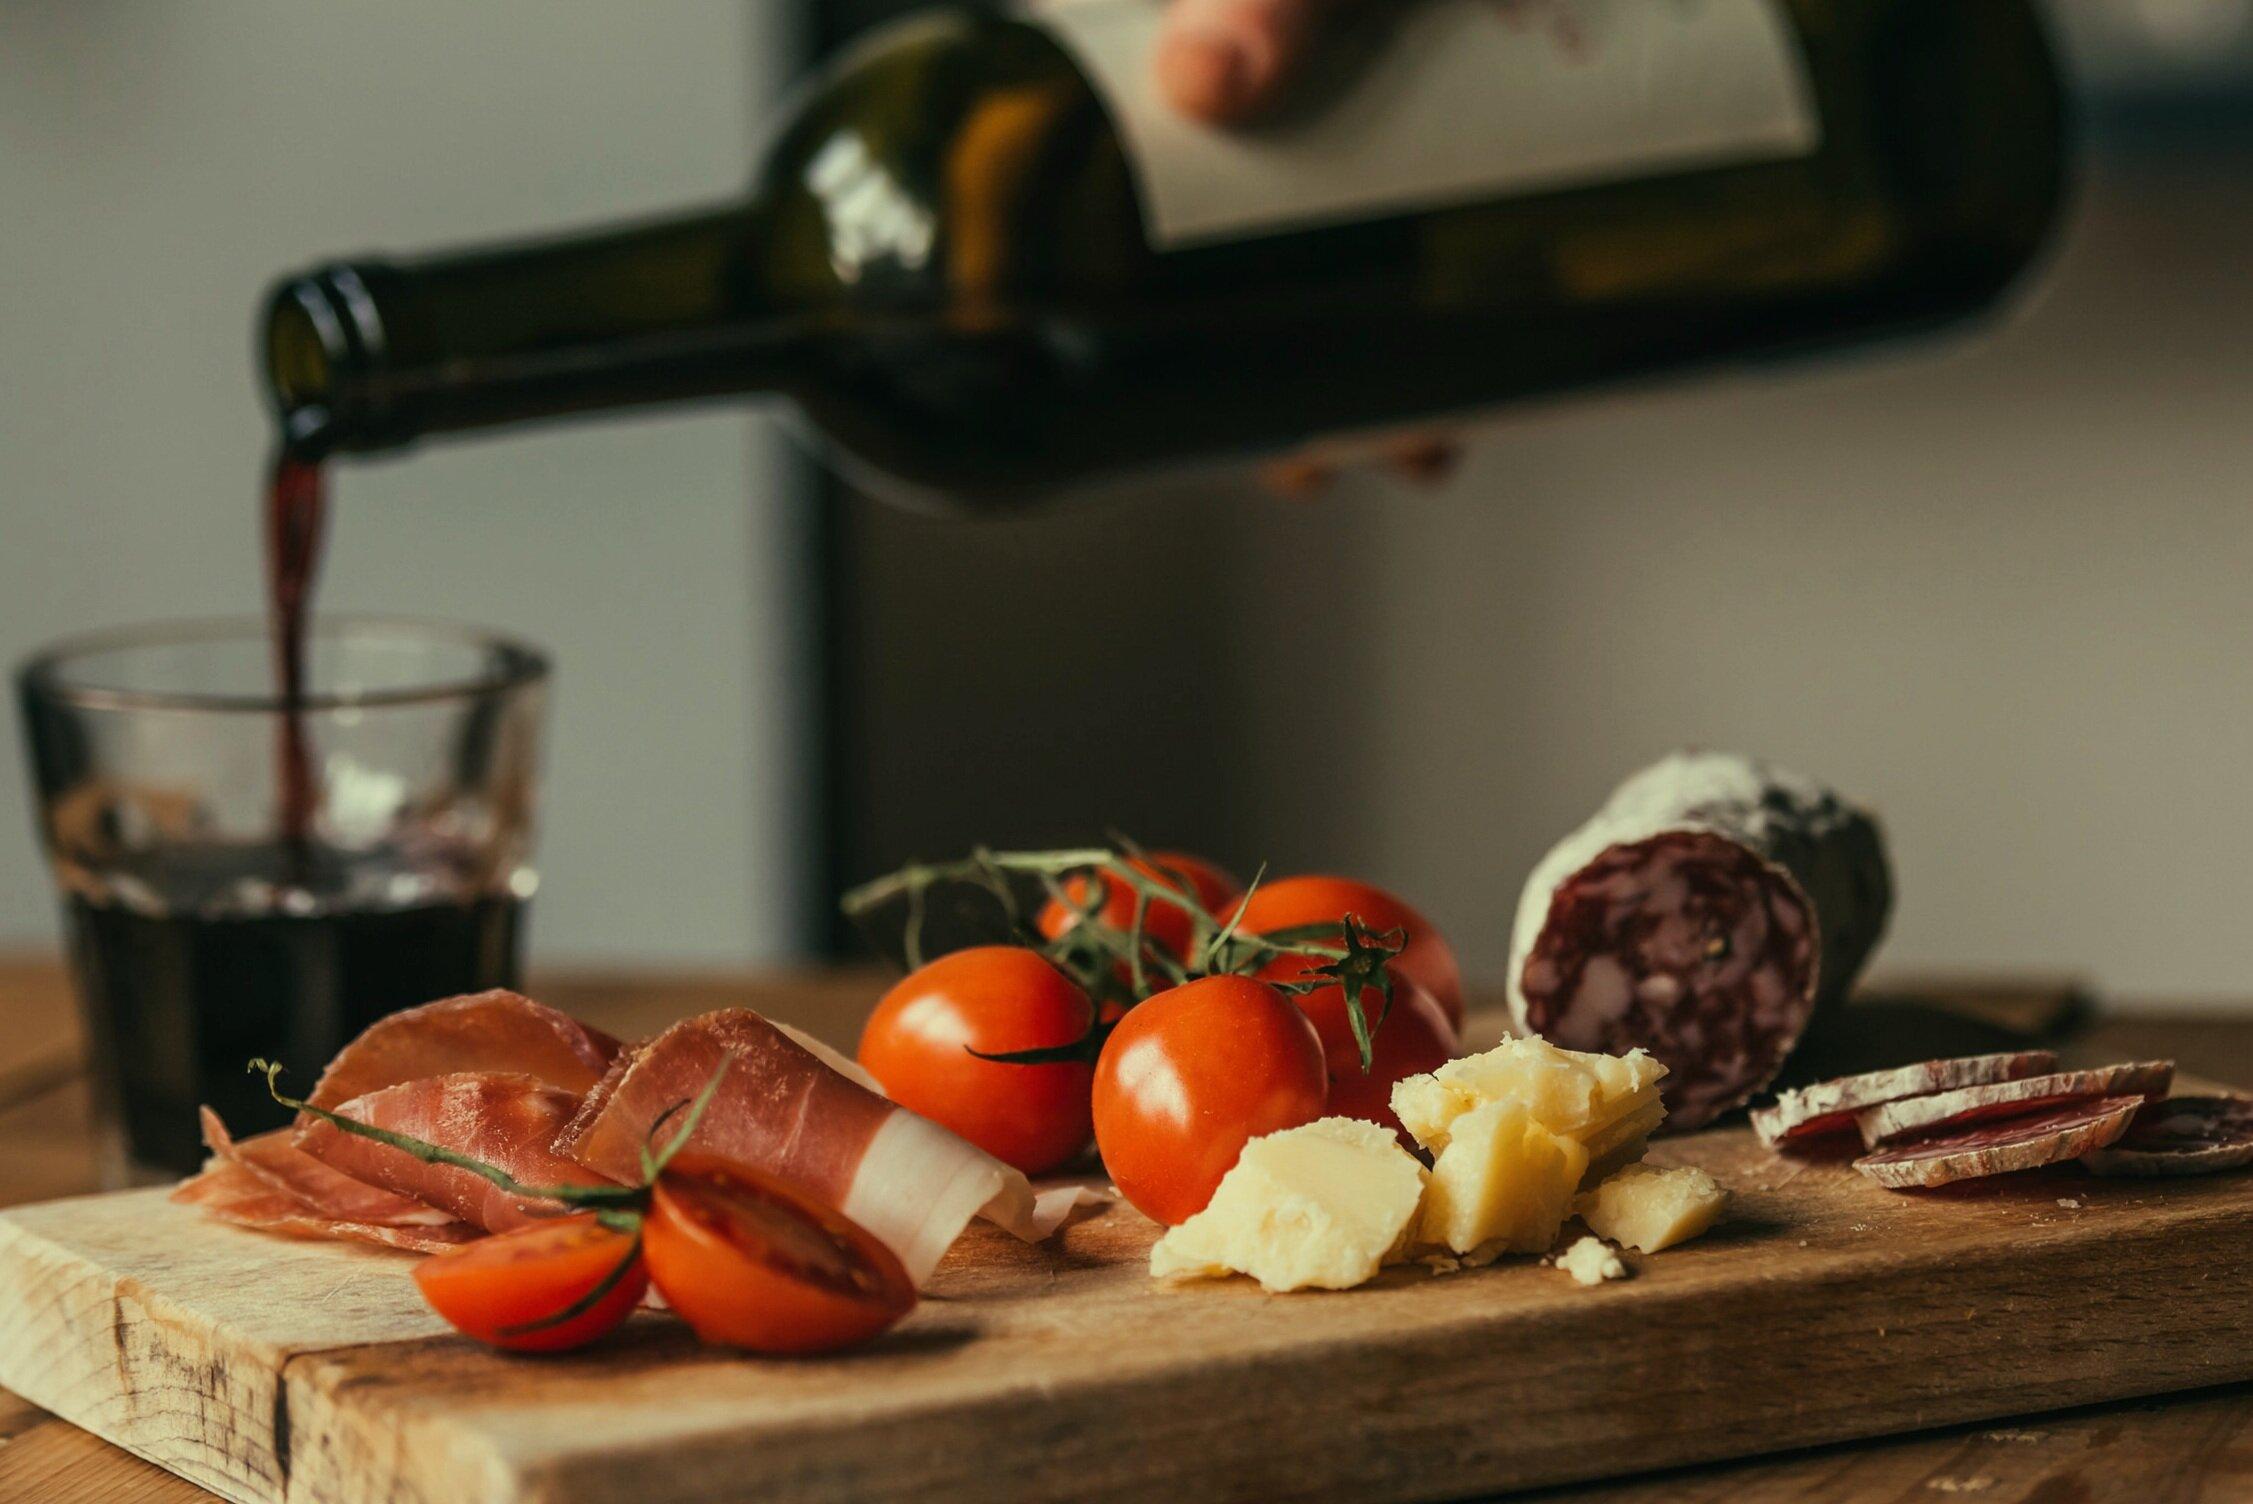 Wines, tapas? Count me in.  (Photo: Yulia Grigoryeva via Shutterstock)